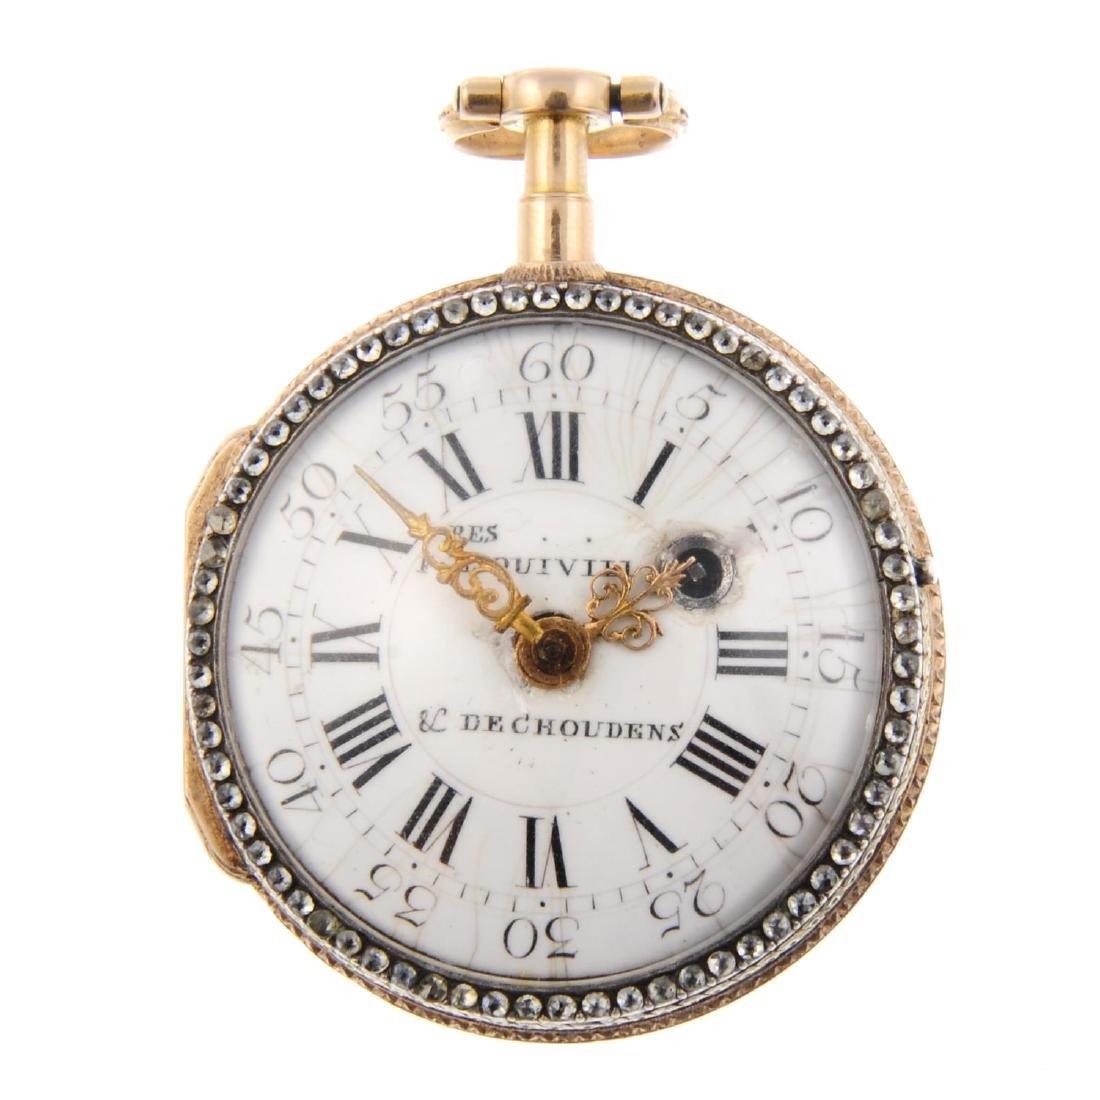 An open face pocket watch by Les Frères Esquivillon &